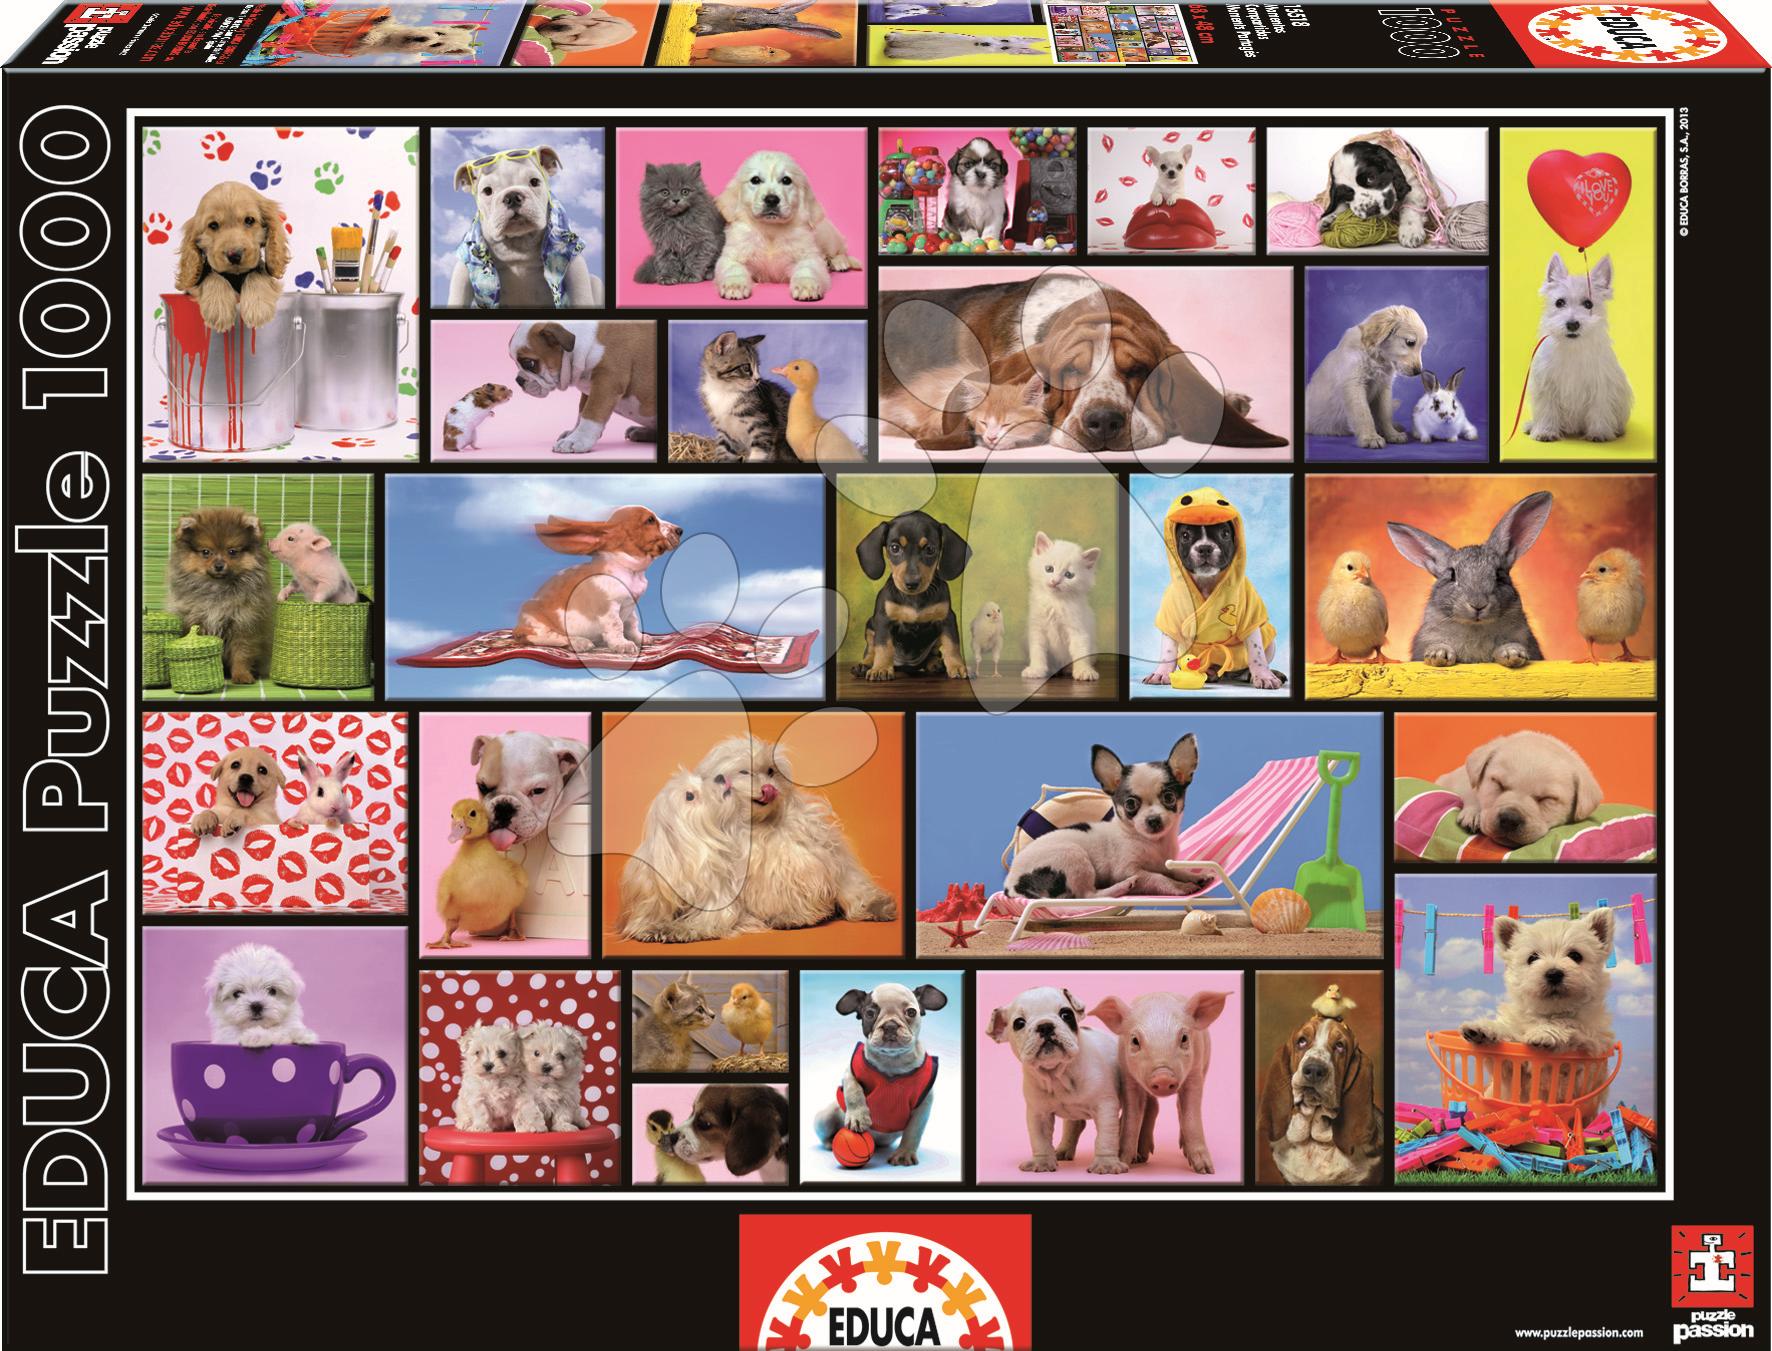 Puzzle Shared Moments Educa 1000 dílů od 12 let